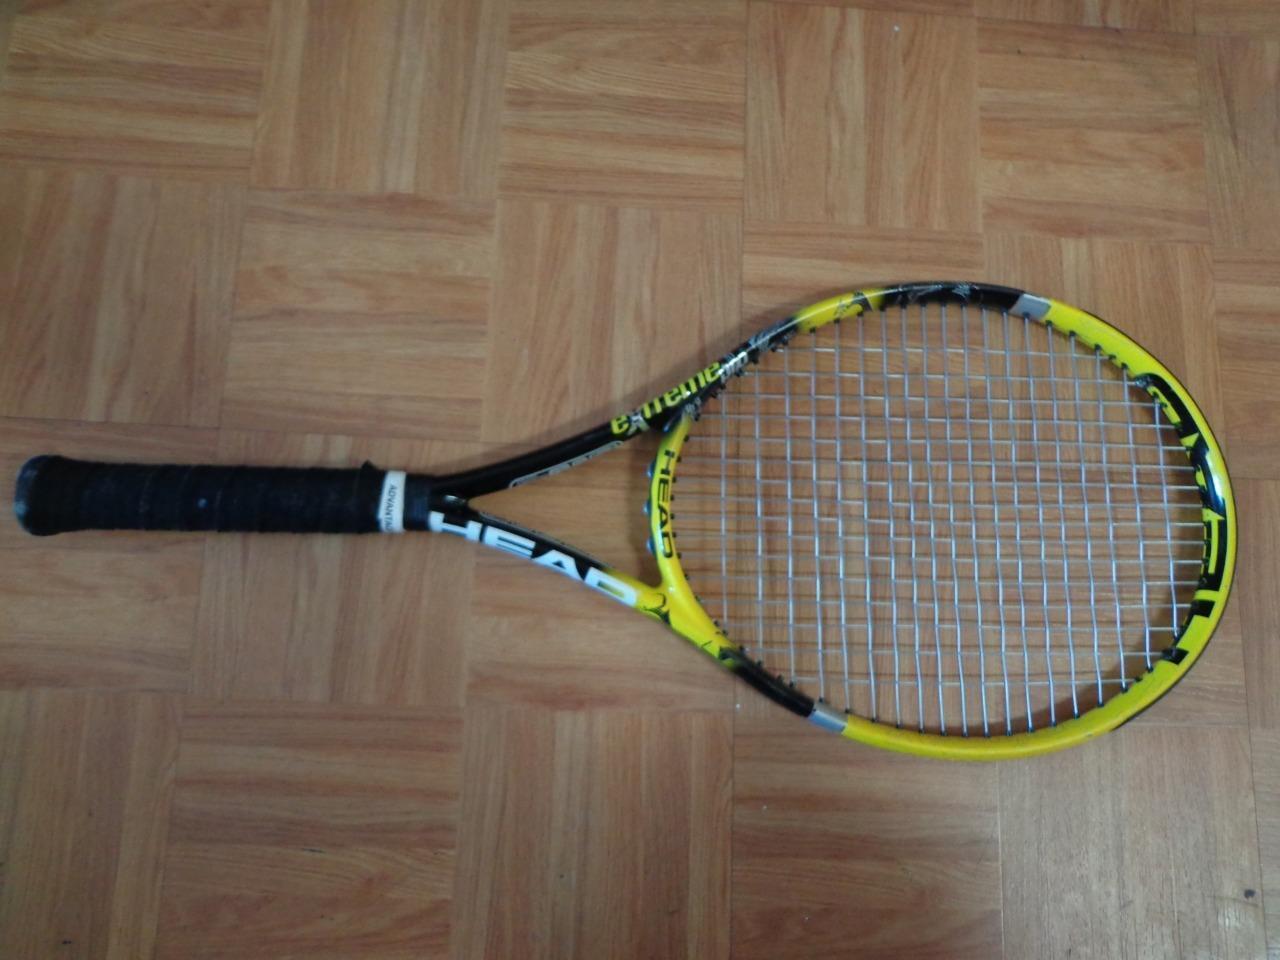 Head YouTEK IG Extreme PRO 100 head 11.1oz  4 1/4 grip Tennis Racquet